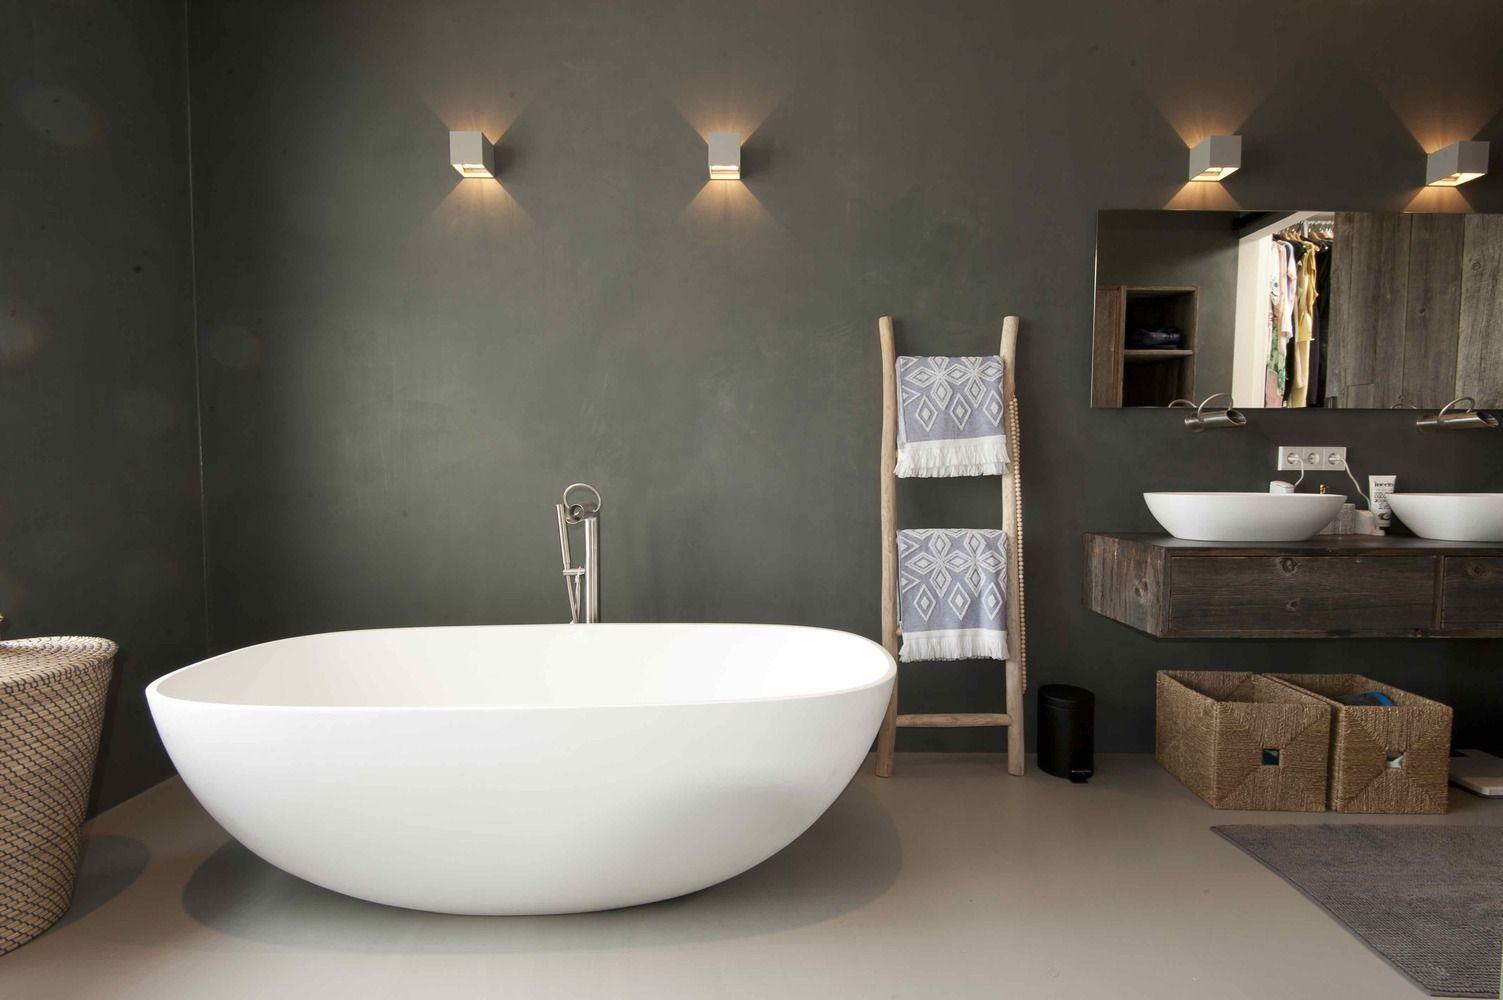 COCOON modern bathroom inspiration bycocoon.com   minimal ...